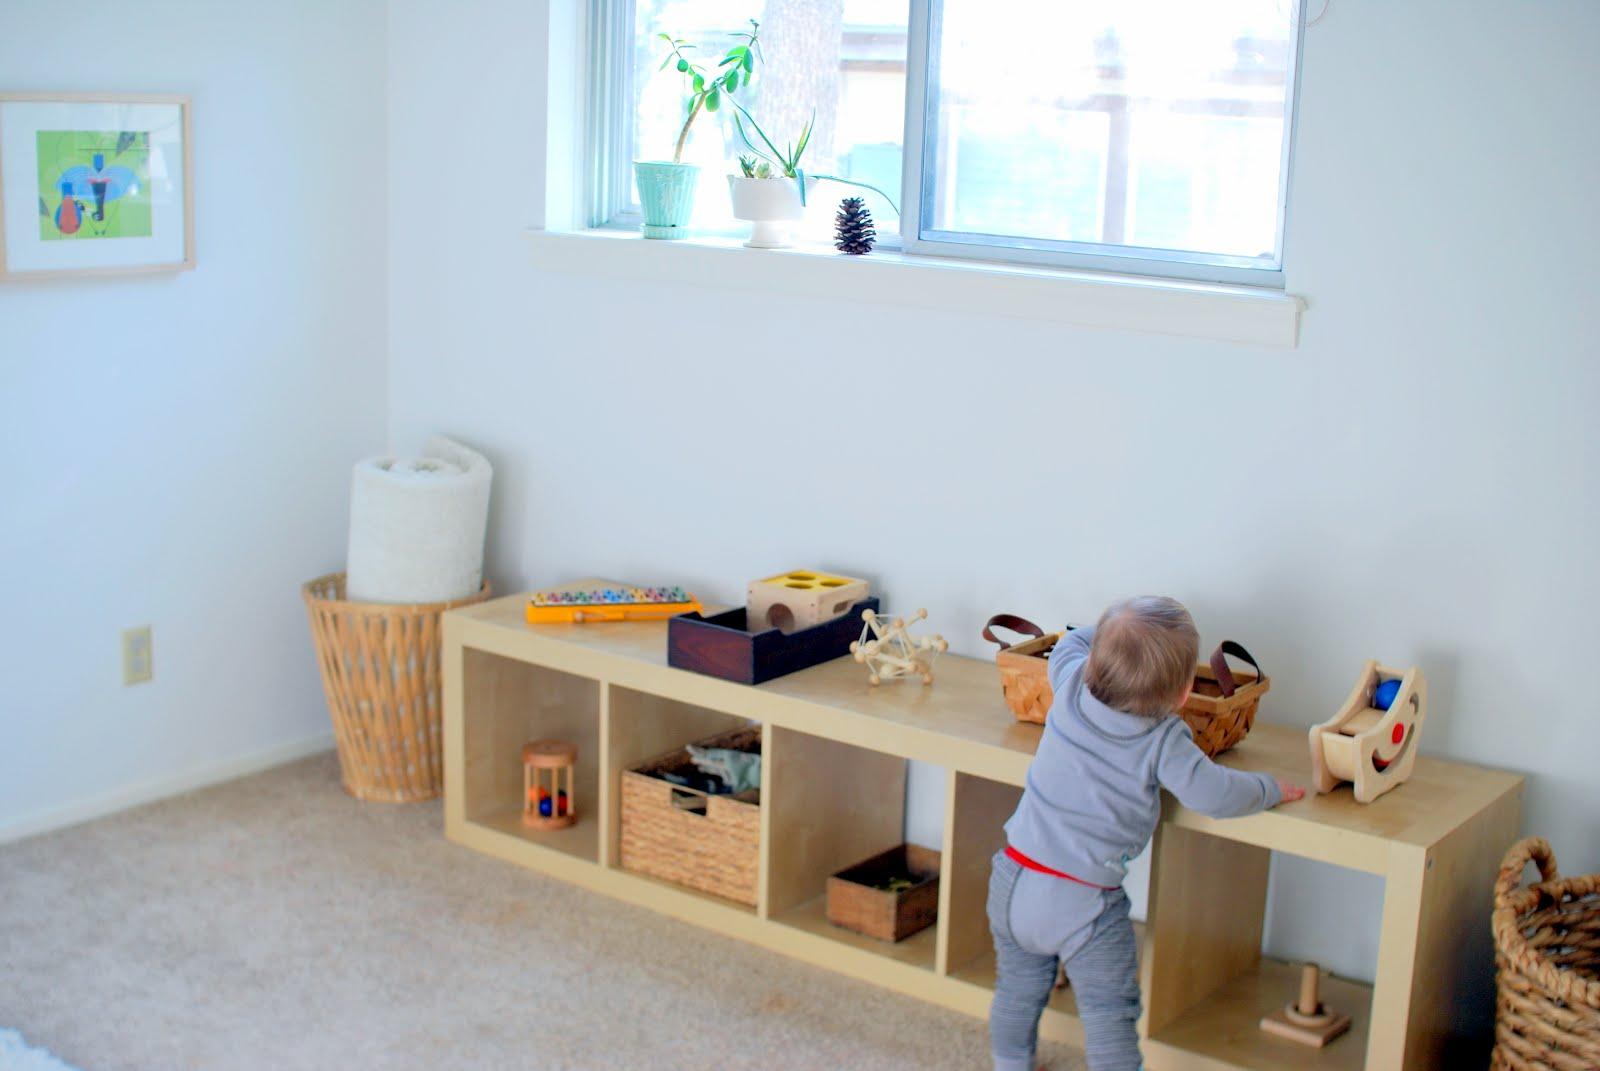 Amenajare Camera Montessori : Cum arata o camera de joaca montessori